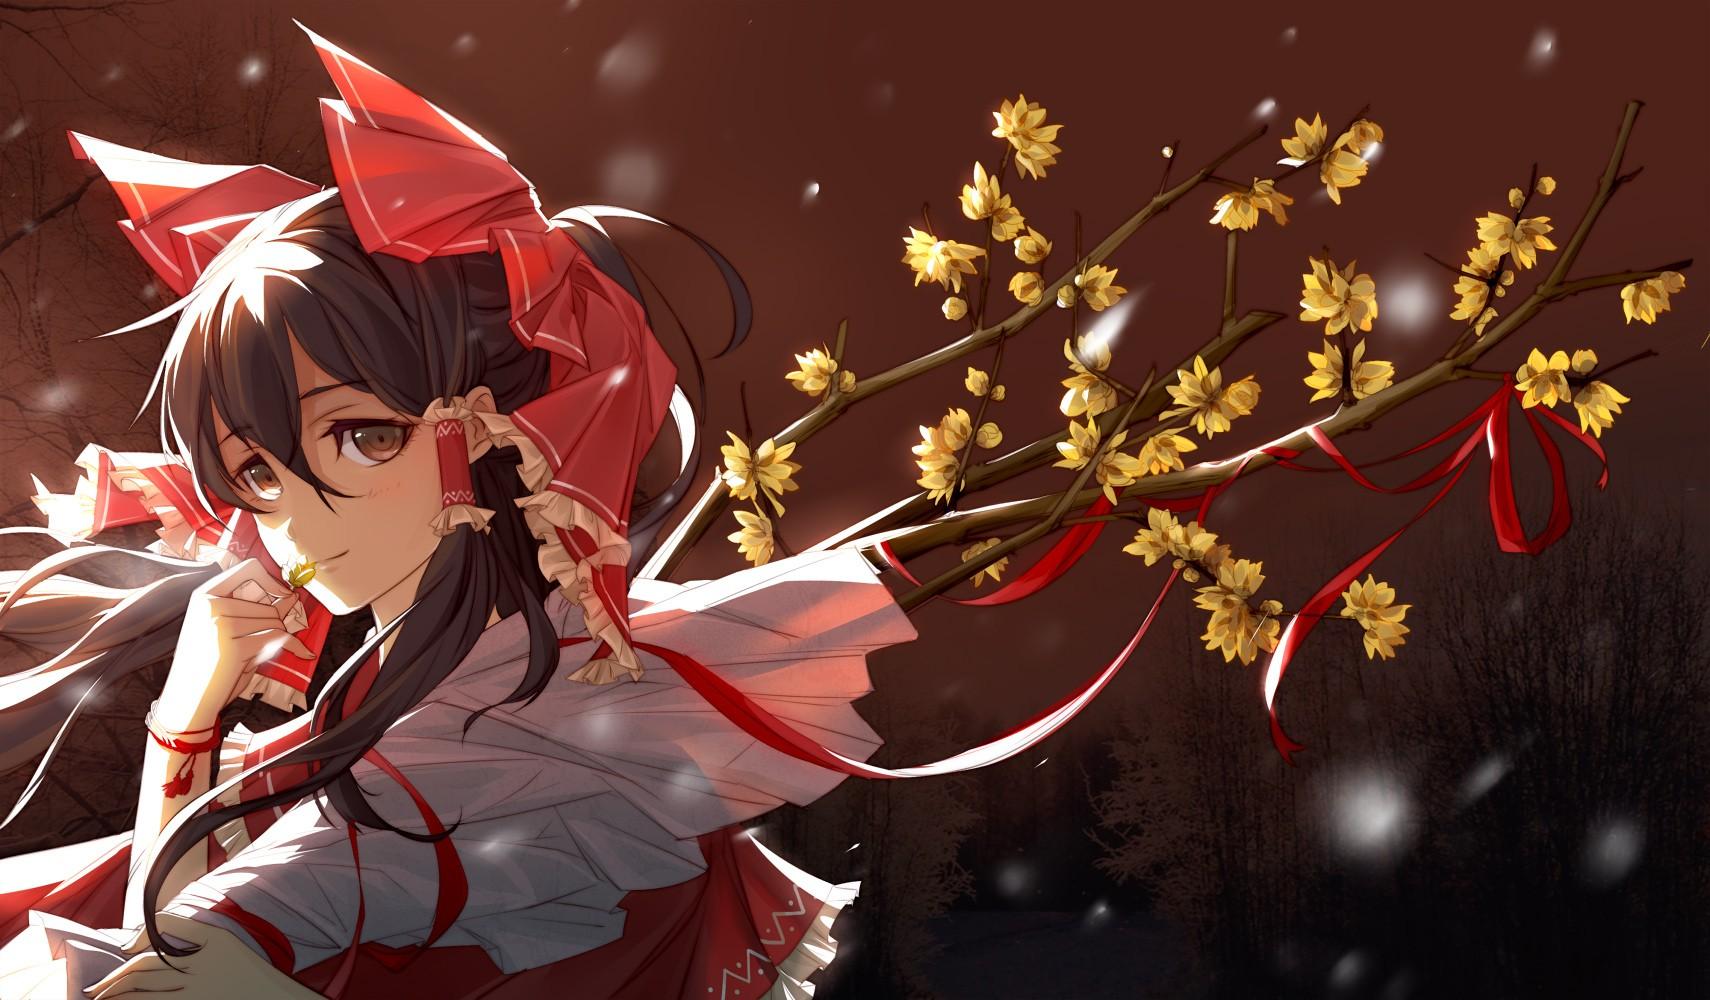 Project Cars Wallpaper Red Touhou Hakurei Reimu Girl Flowers Wallpaper Anime